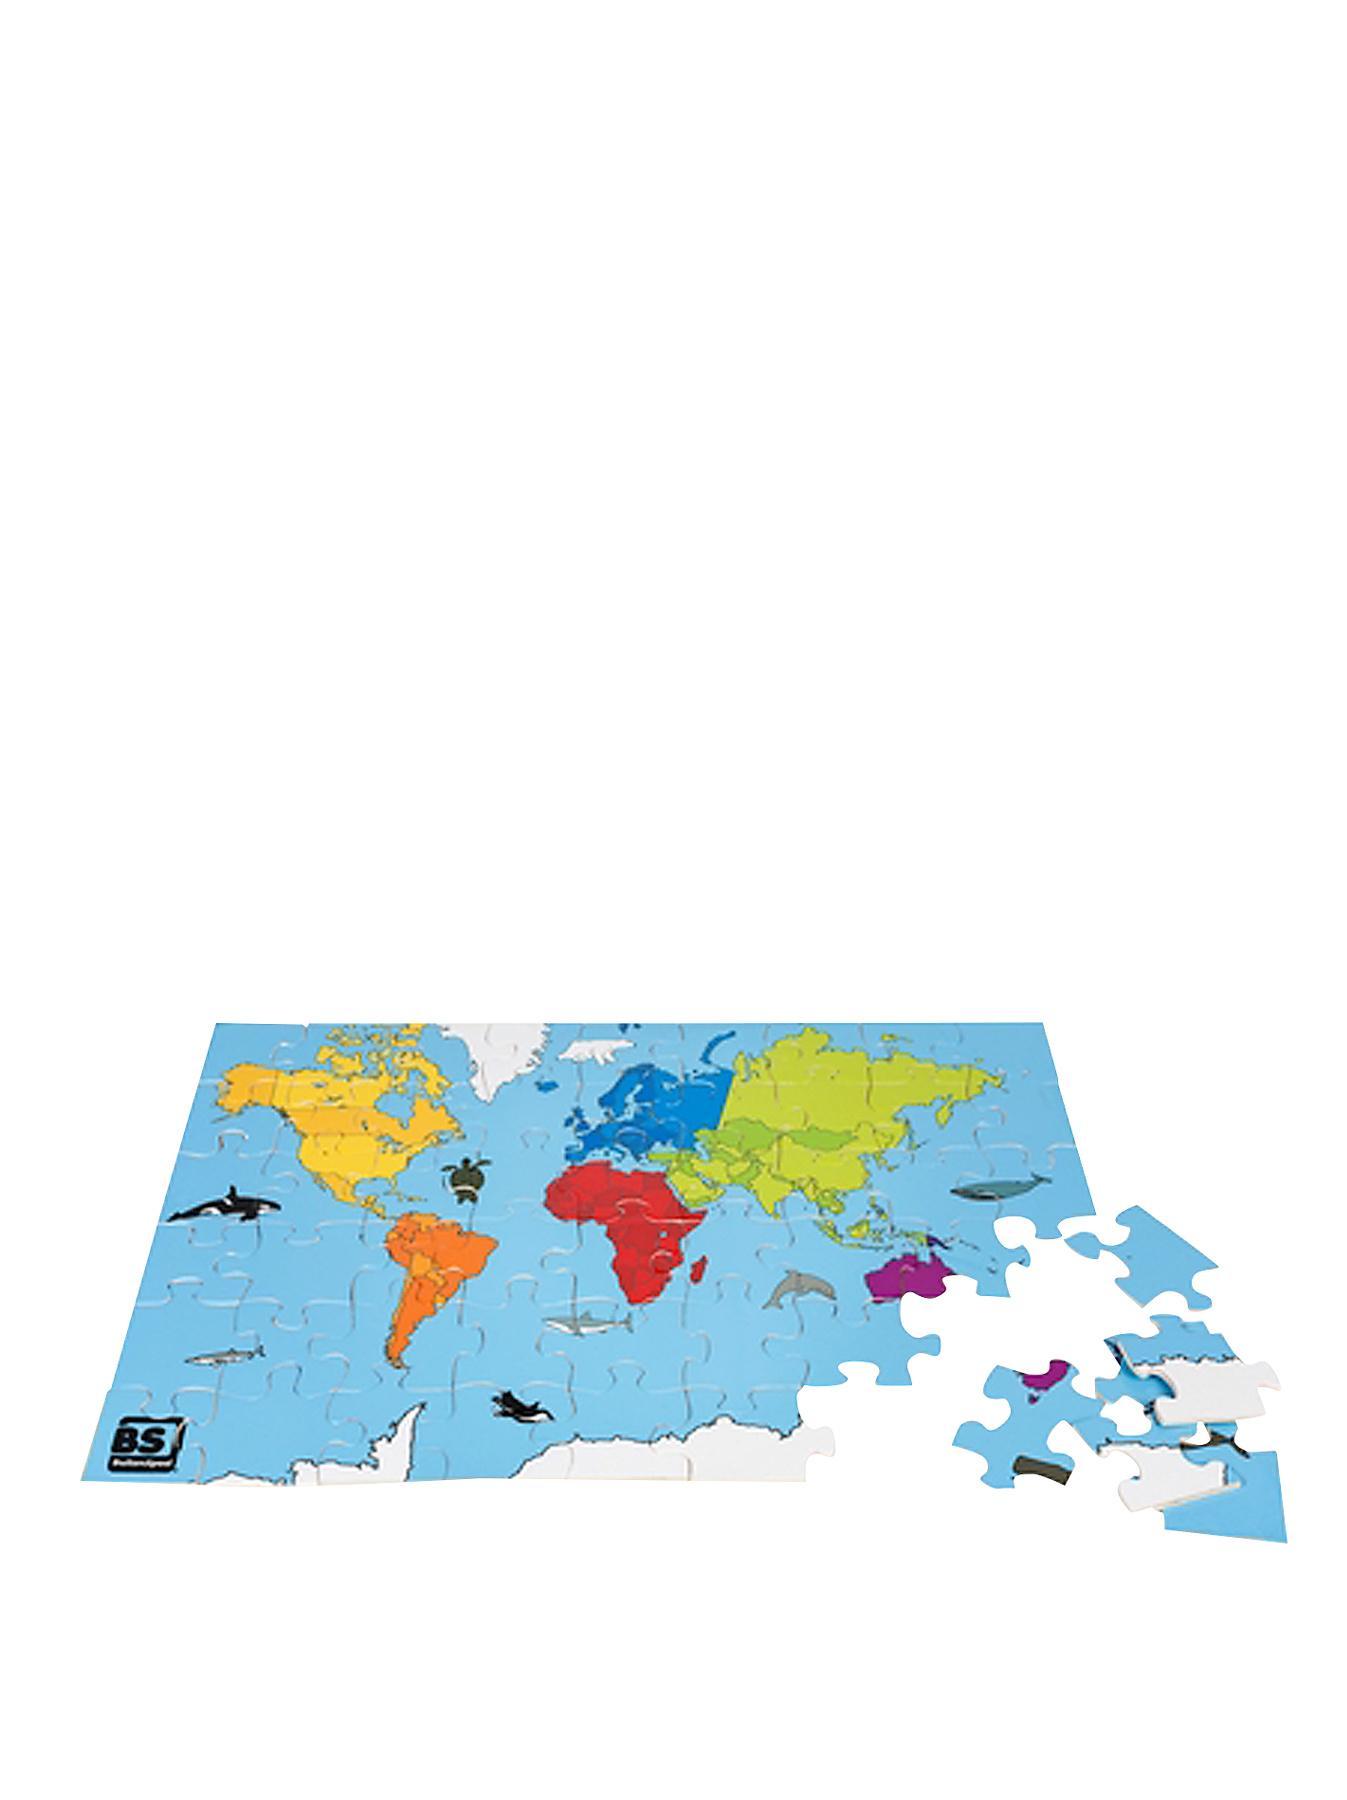 54-Piece World Puzzle